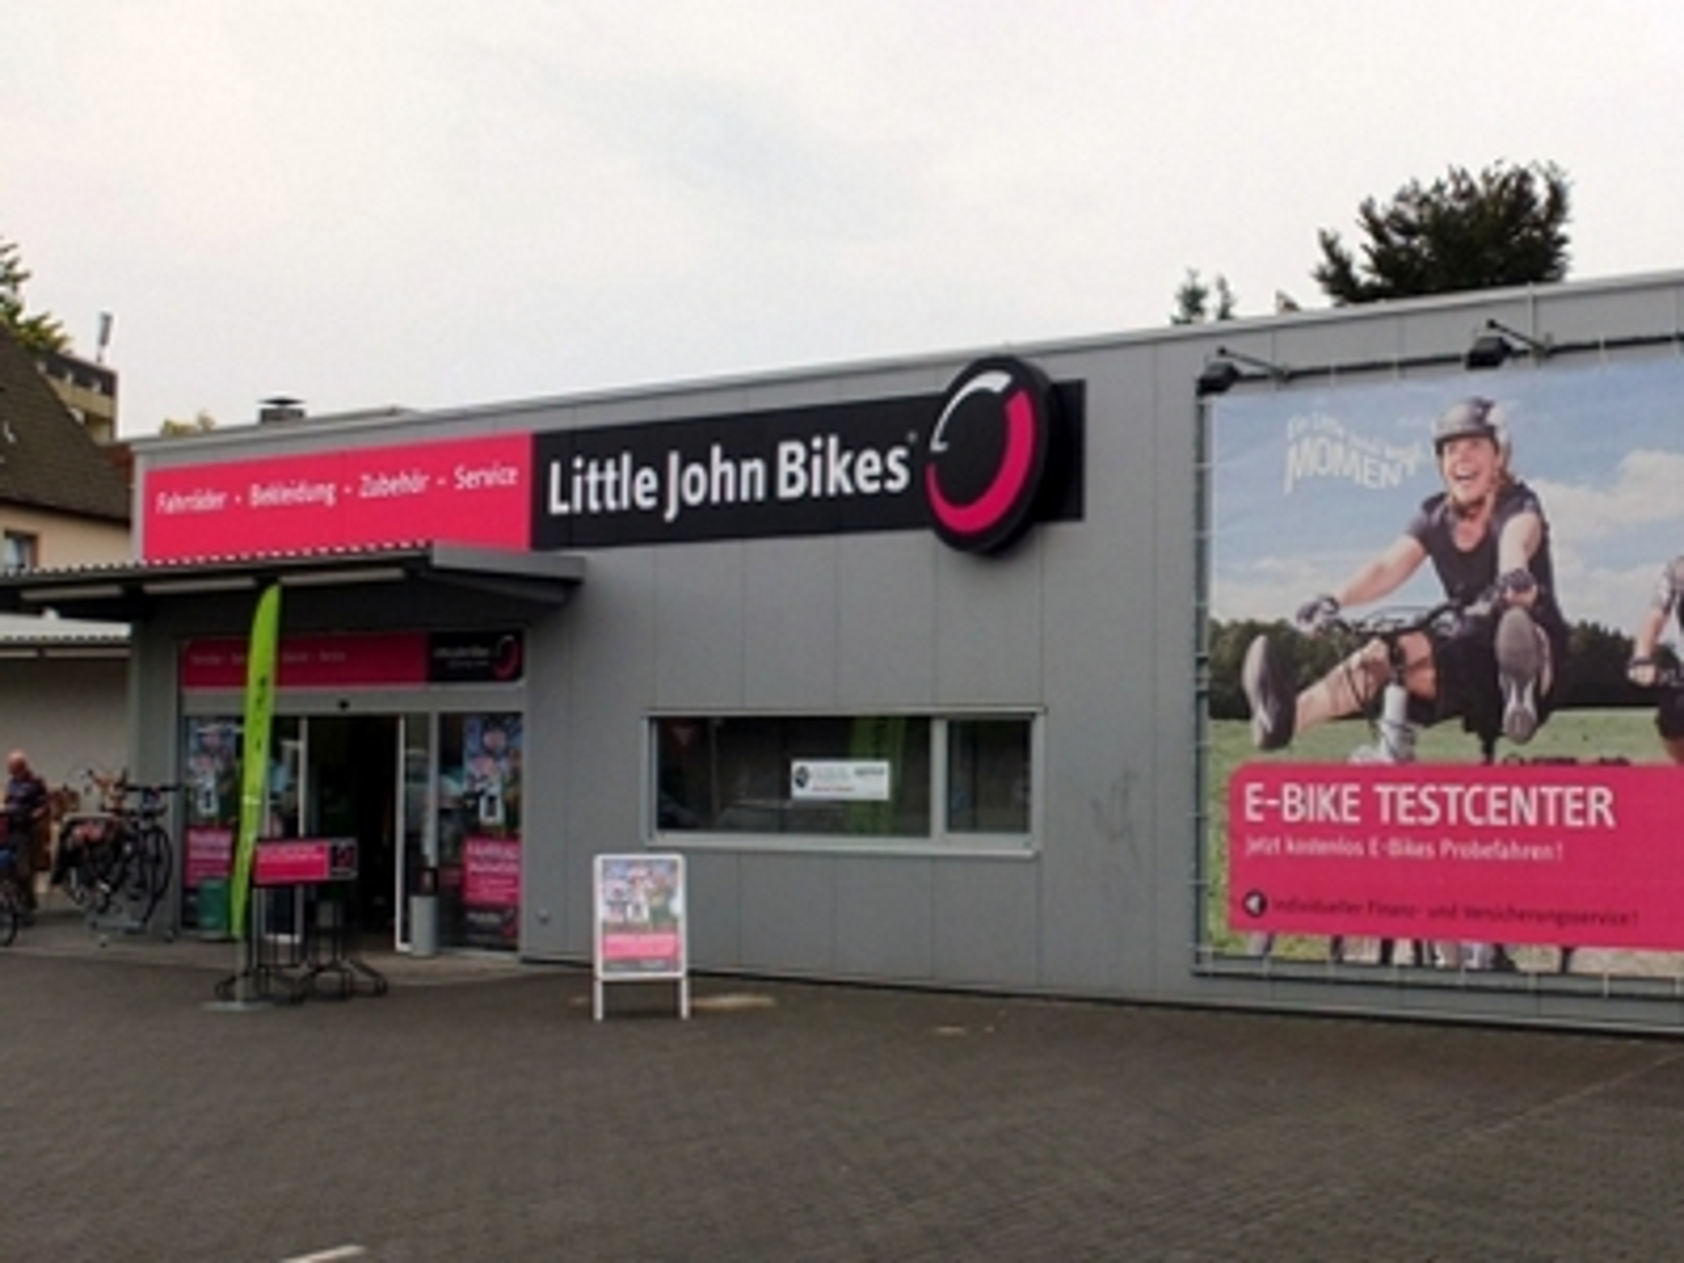 Little John Bikes GmbH